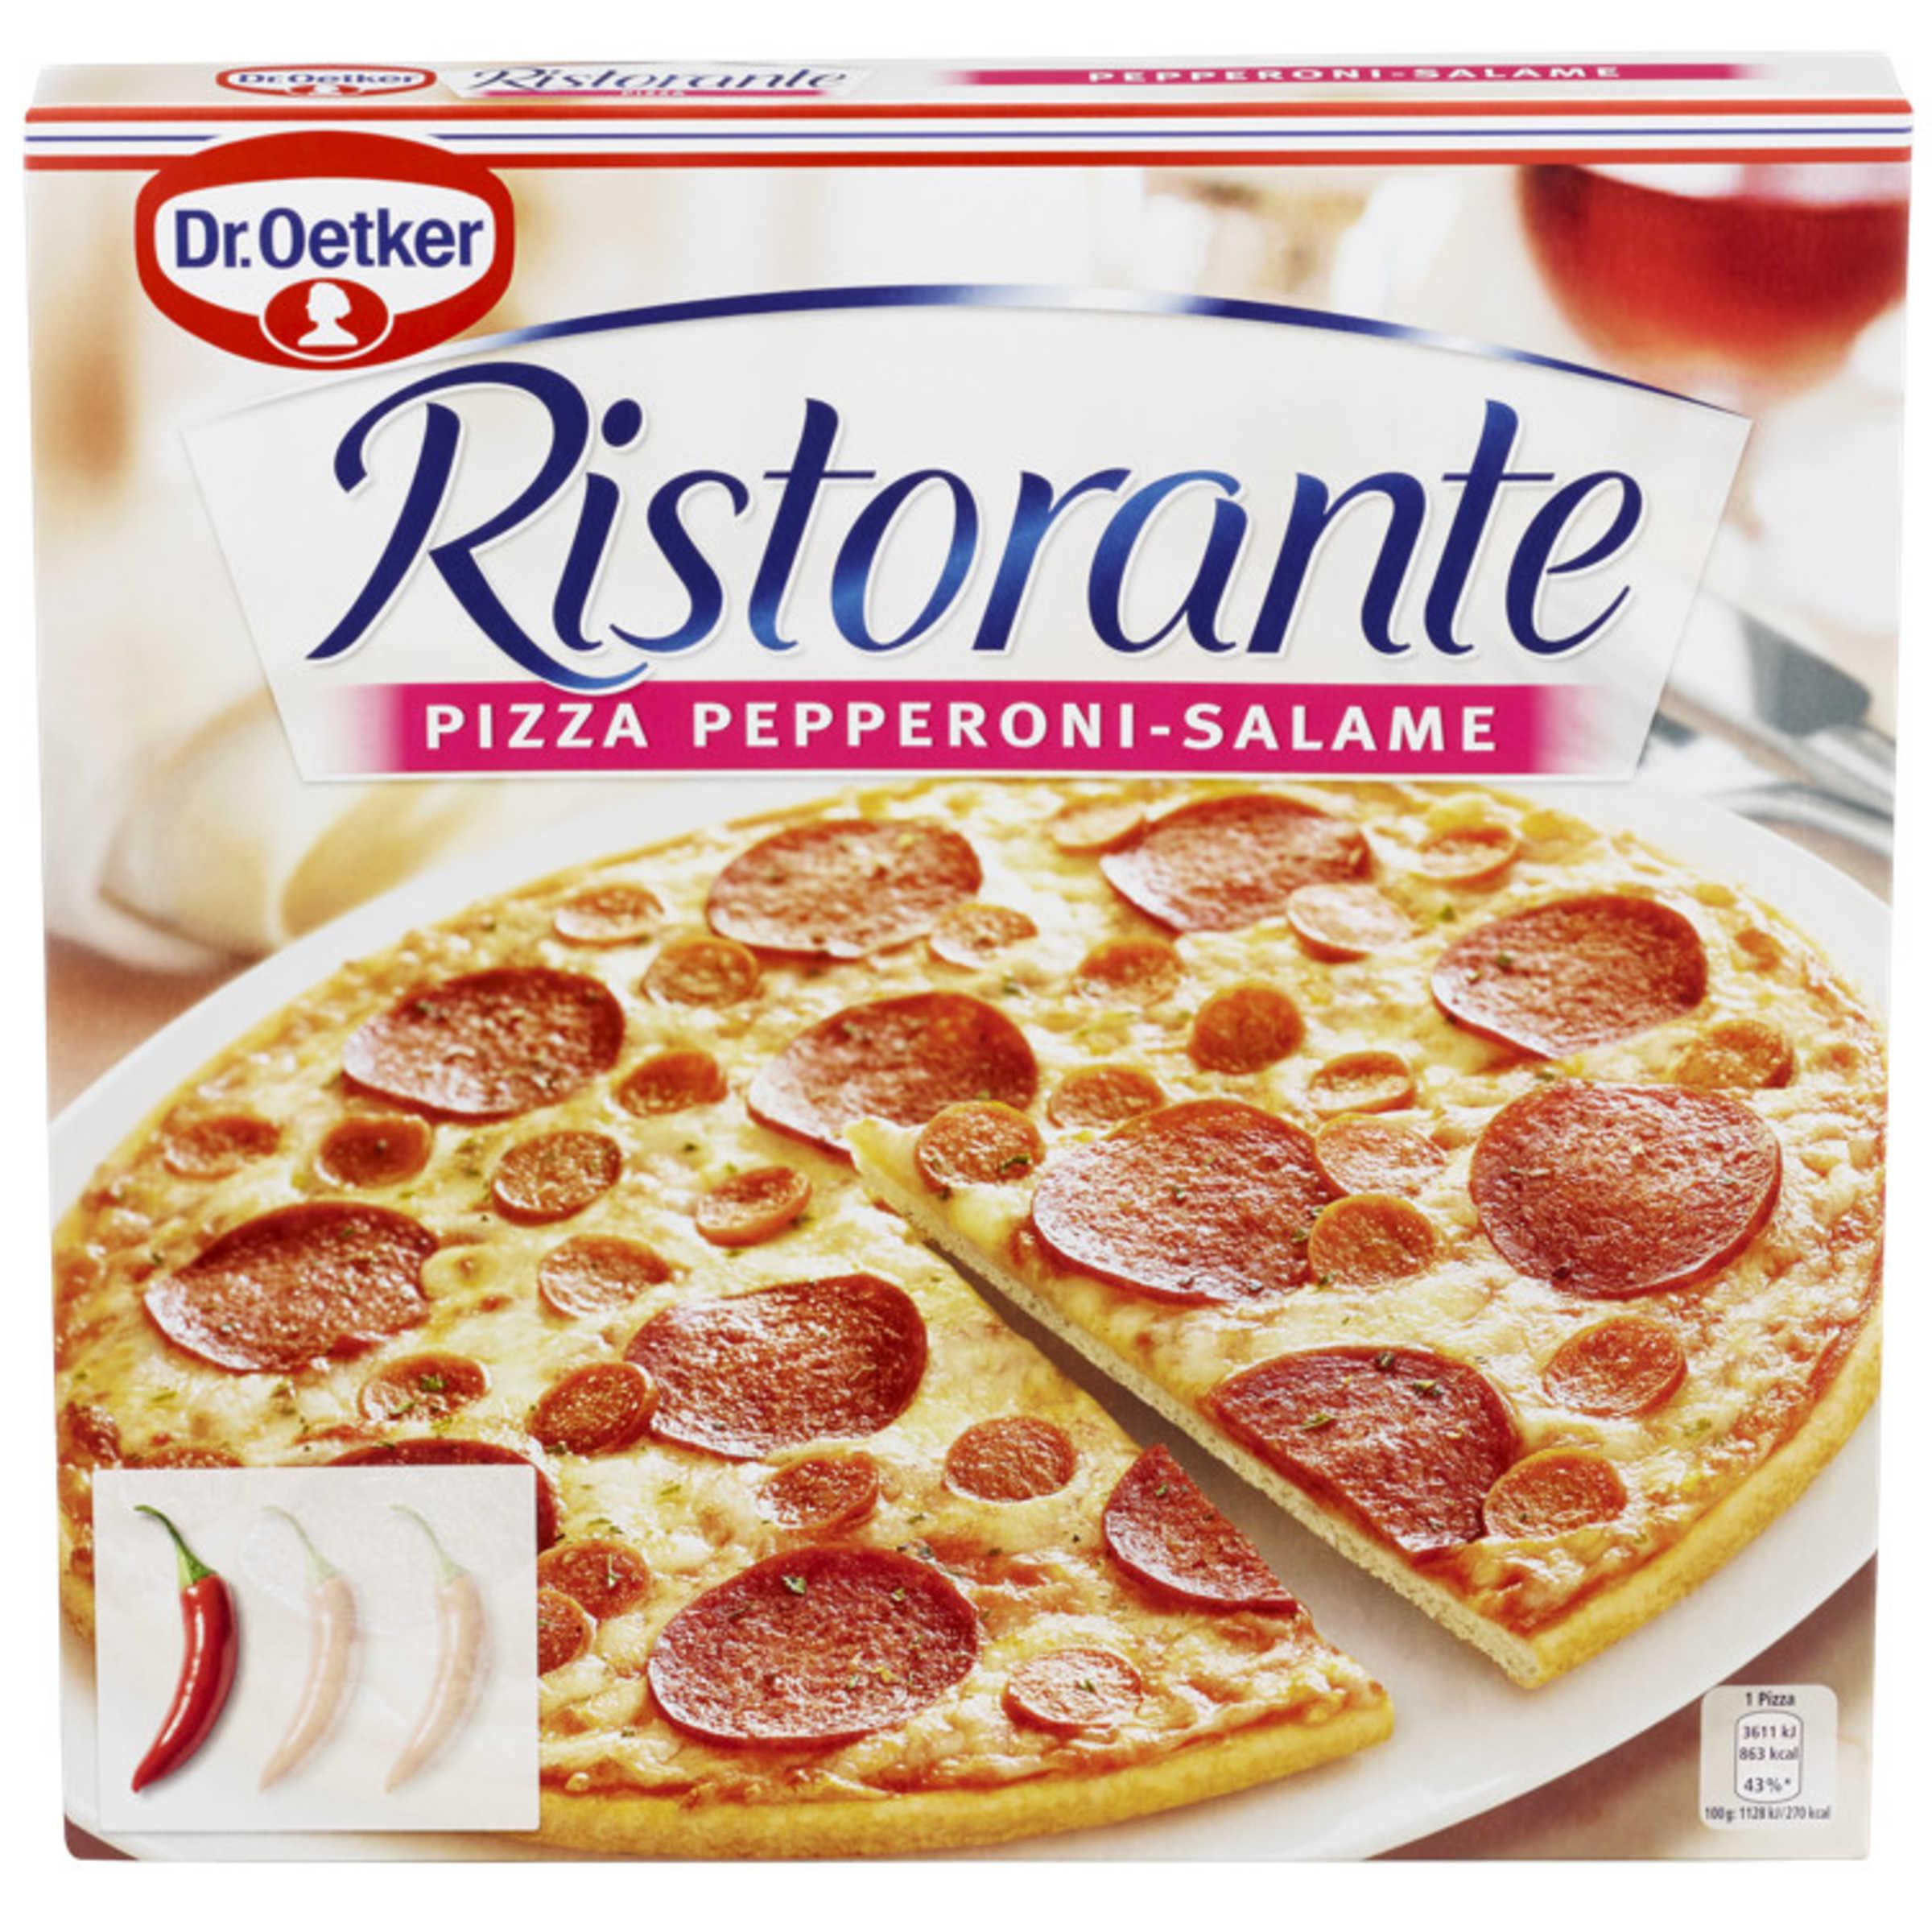 Ristorante Pizza - Pepperoni/Salame 320g Dr.Oetker | Meny.no